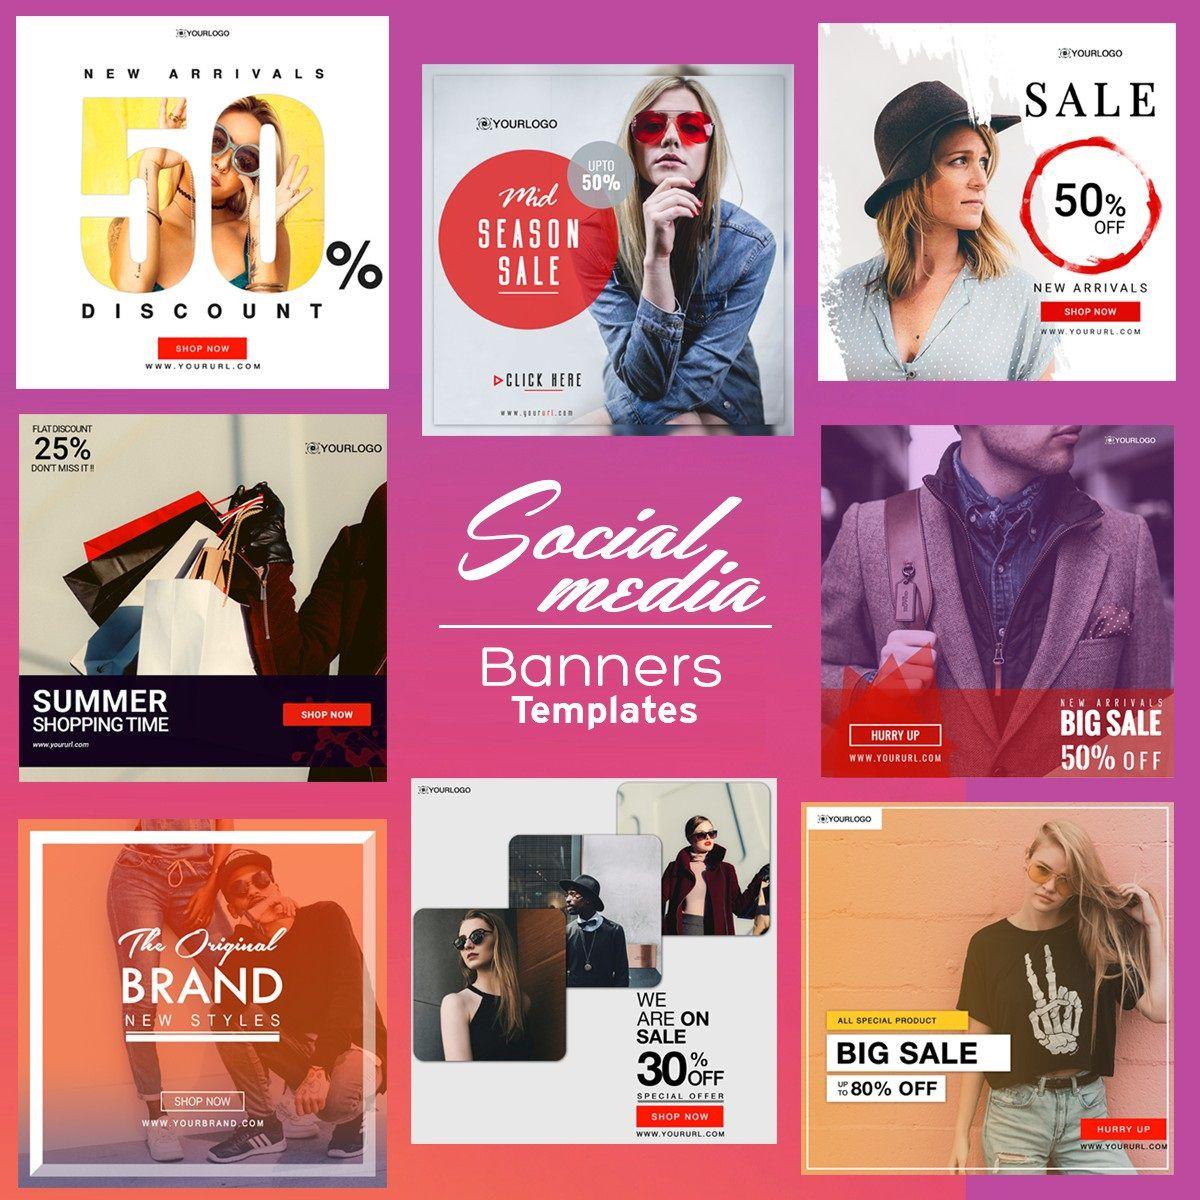 009 Sensational Social Media Banner Template Free Idea Full